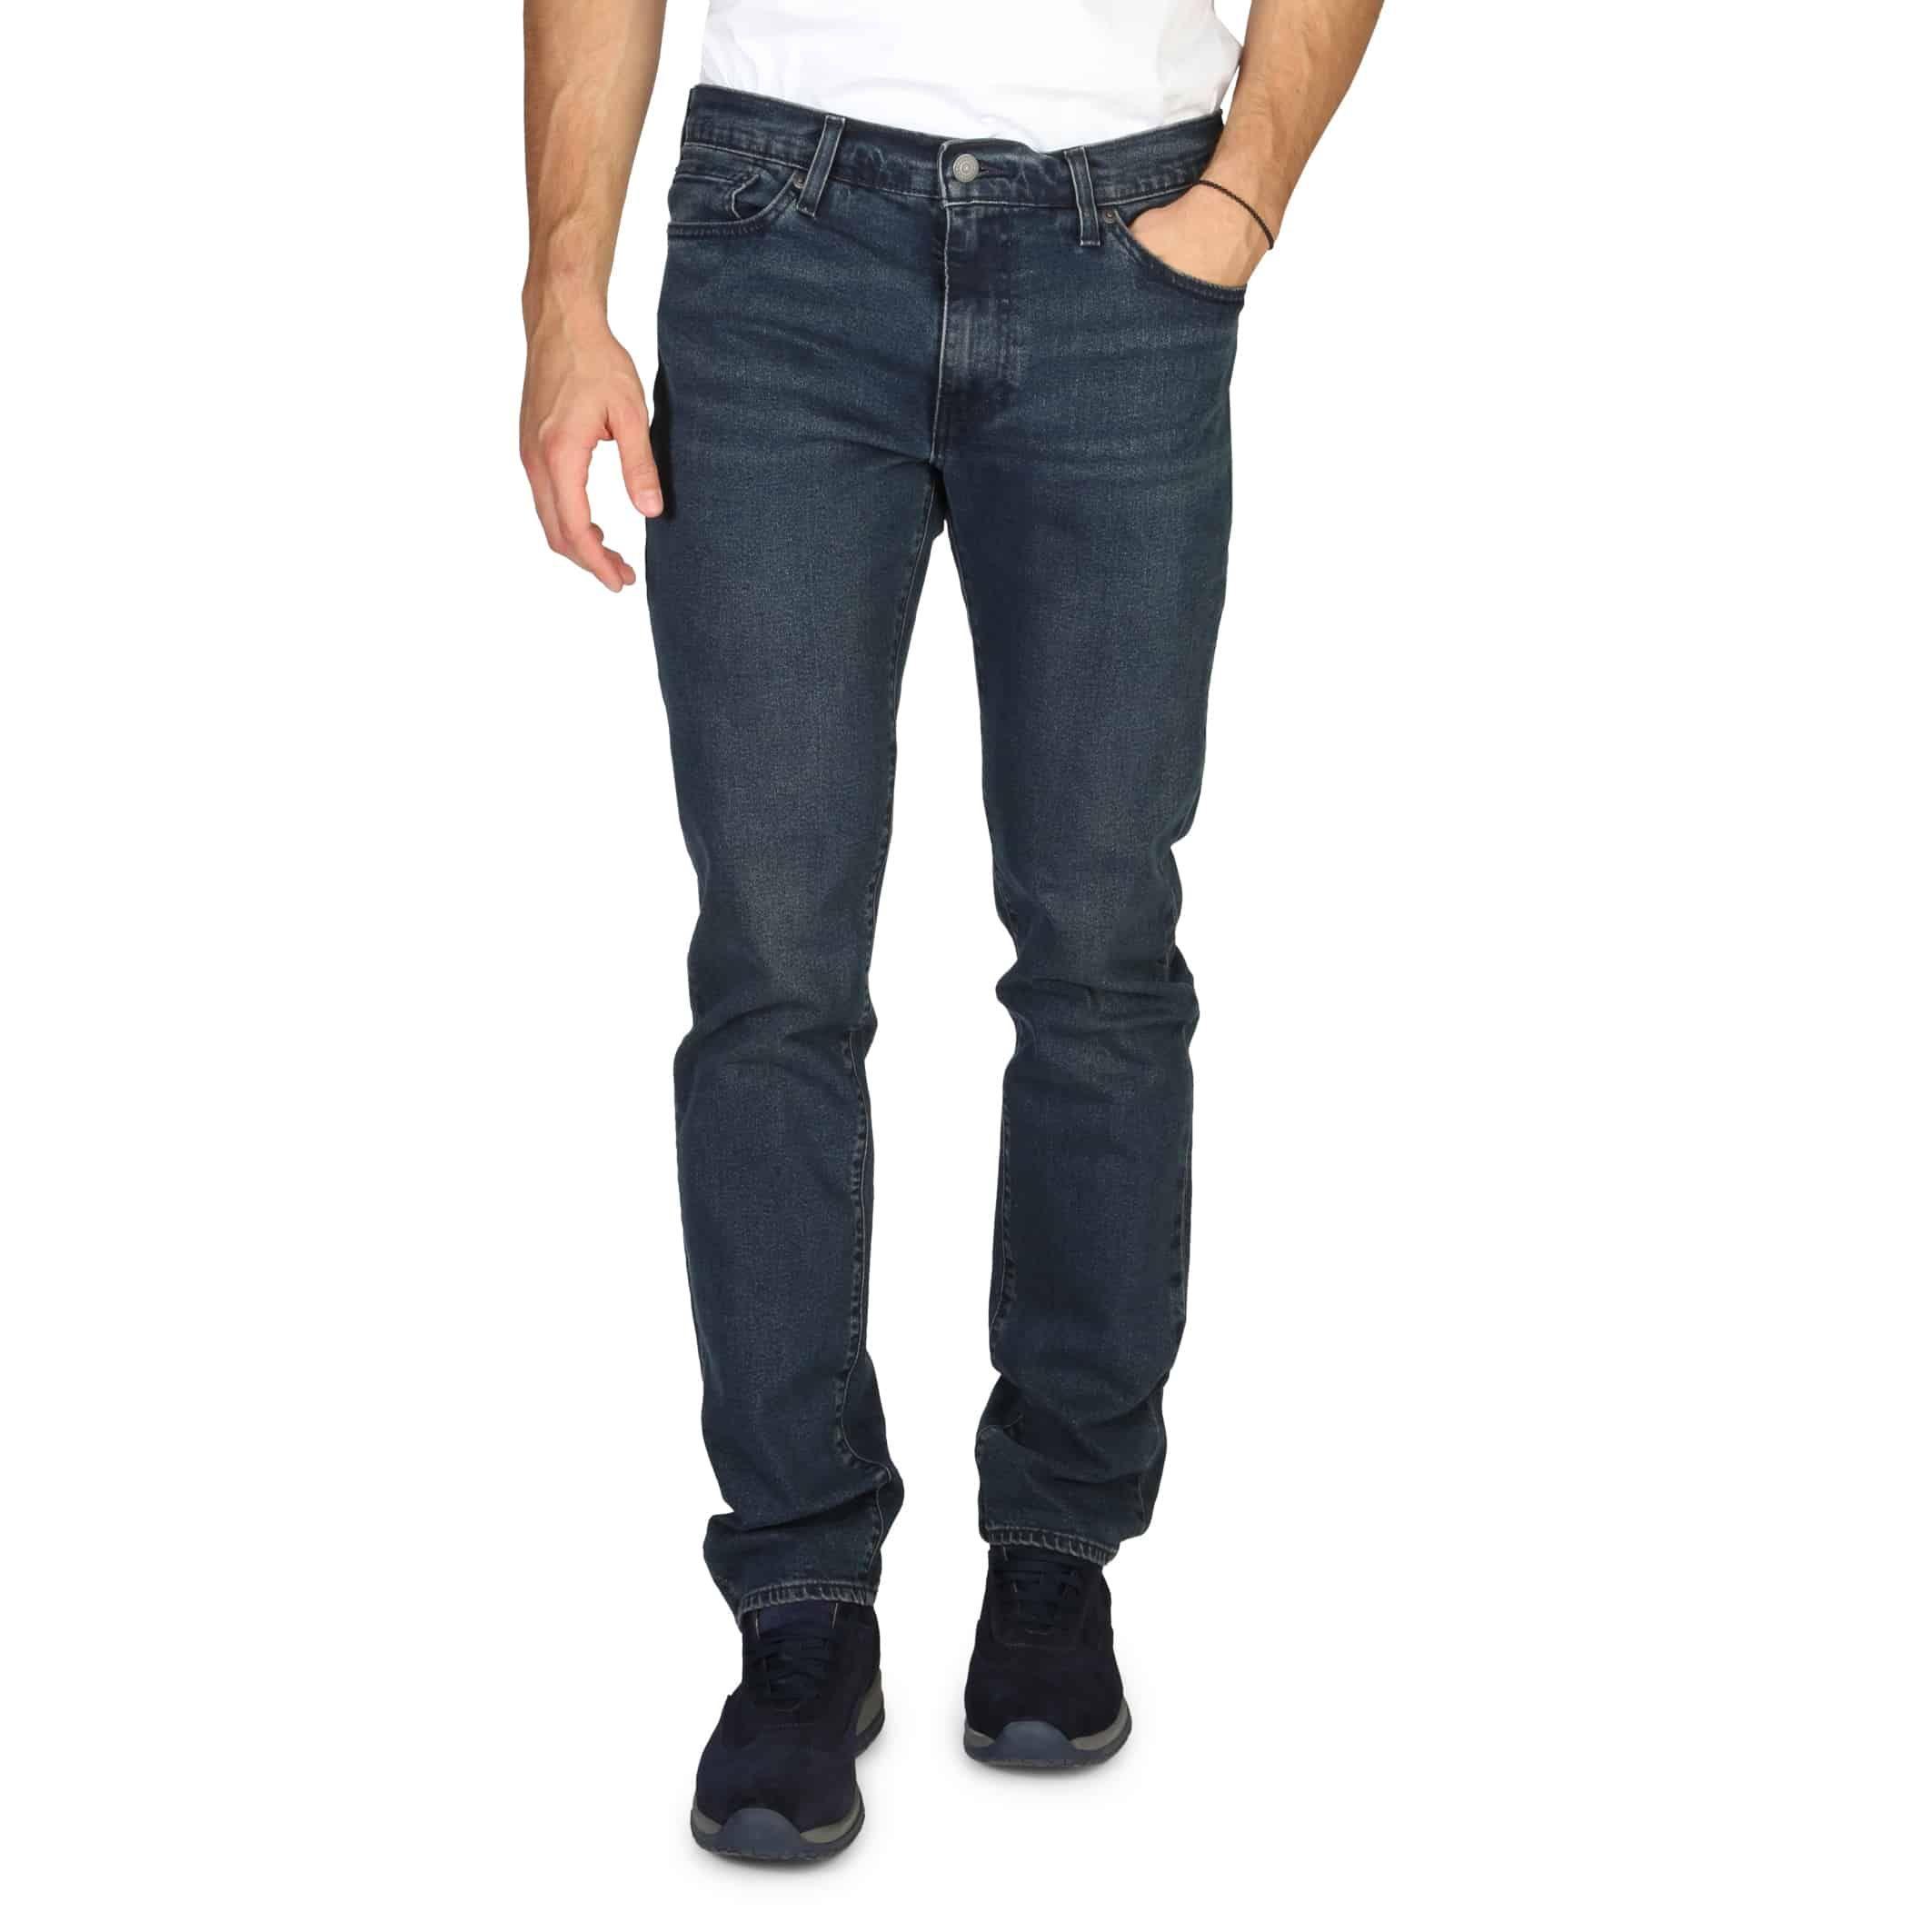 Jeans Levi's – 511-SLIM